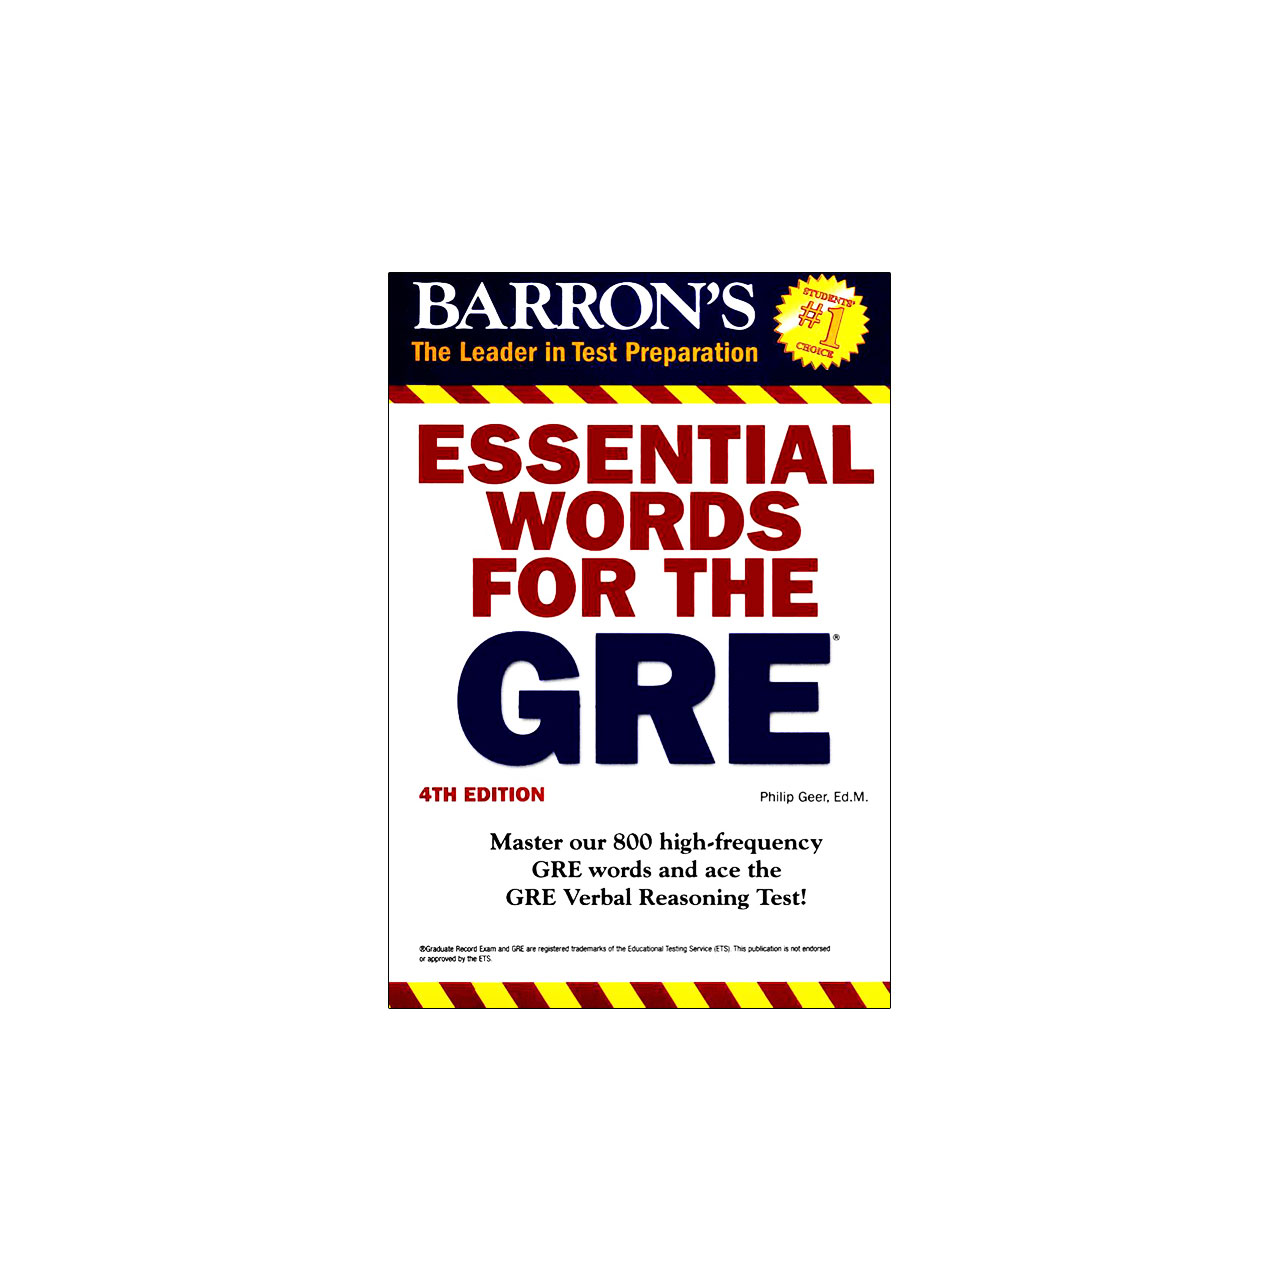 خرید                      کتاب Essential words for the GRE اثر Philip Geer انتشارات Barrons